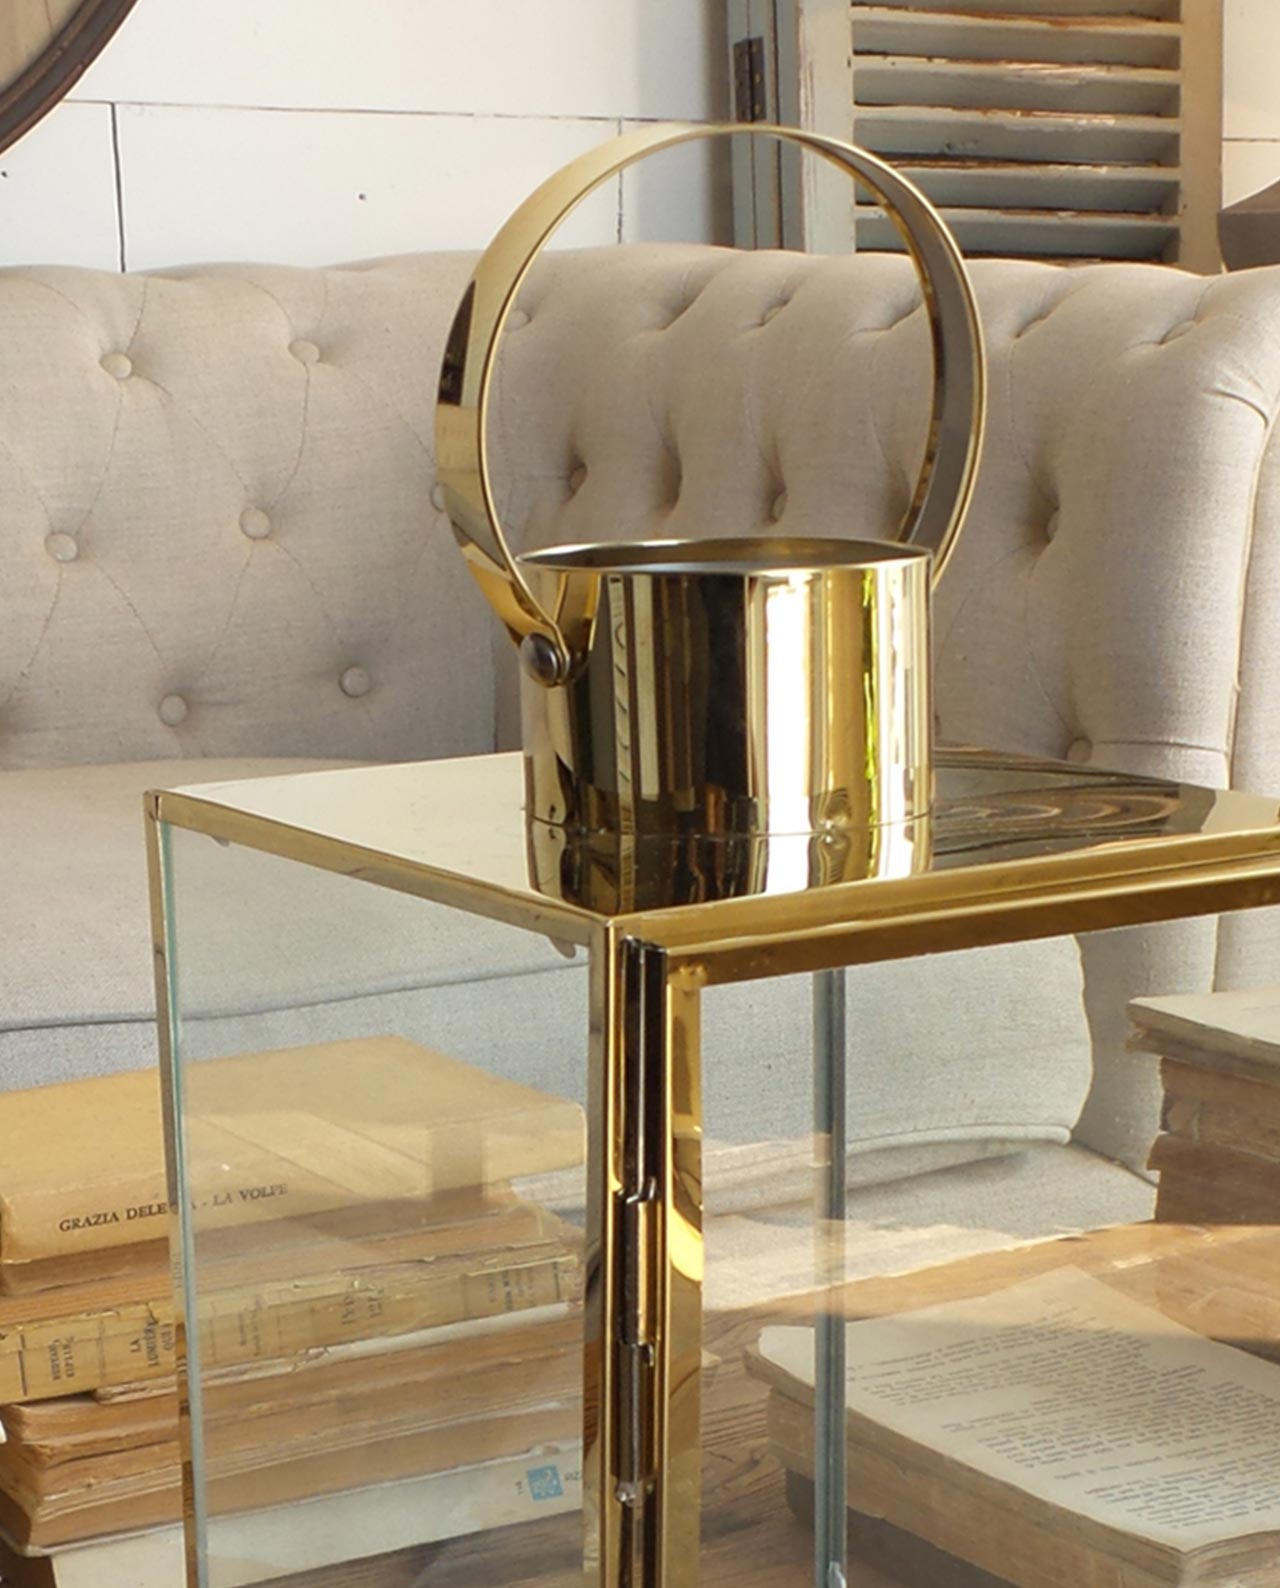 Lanterne acciaio e vetro stile vintage in offerta - Casa in acciaio e vetro ...